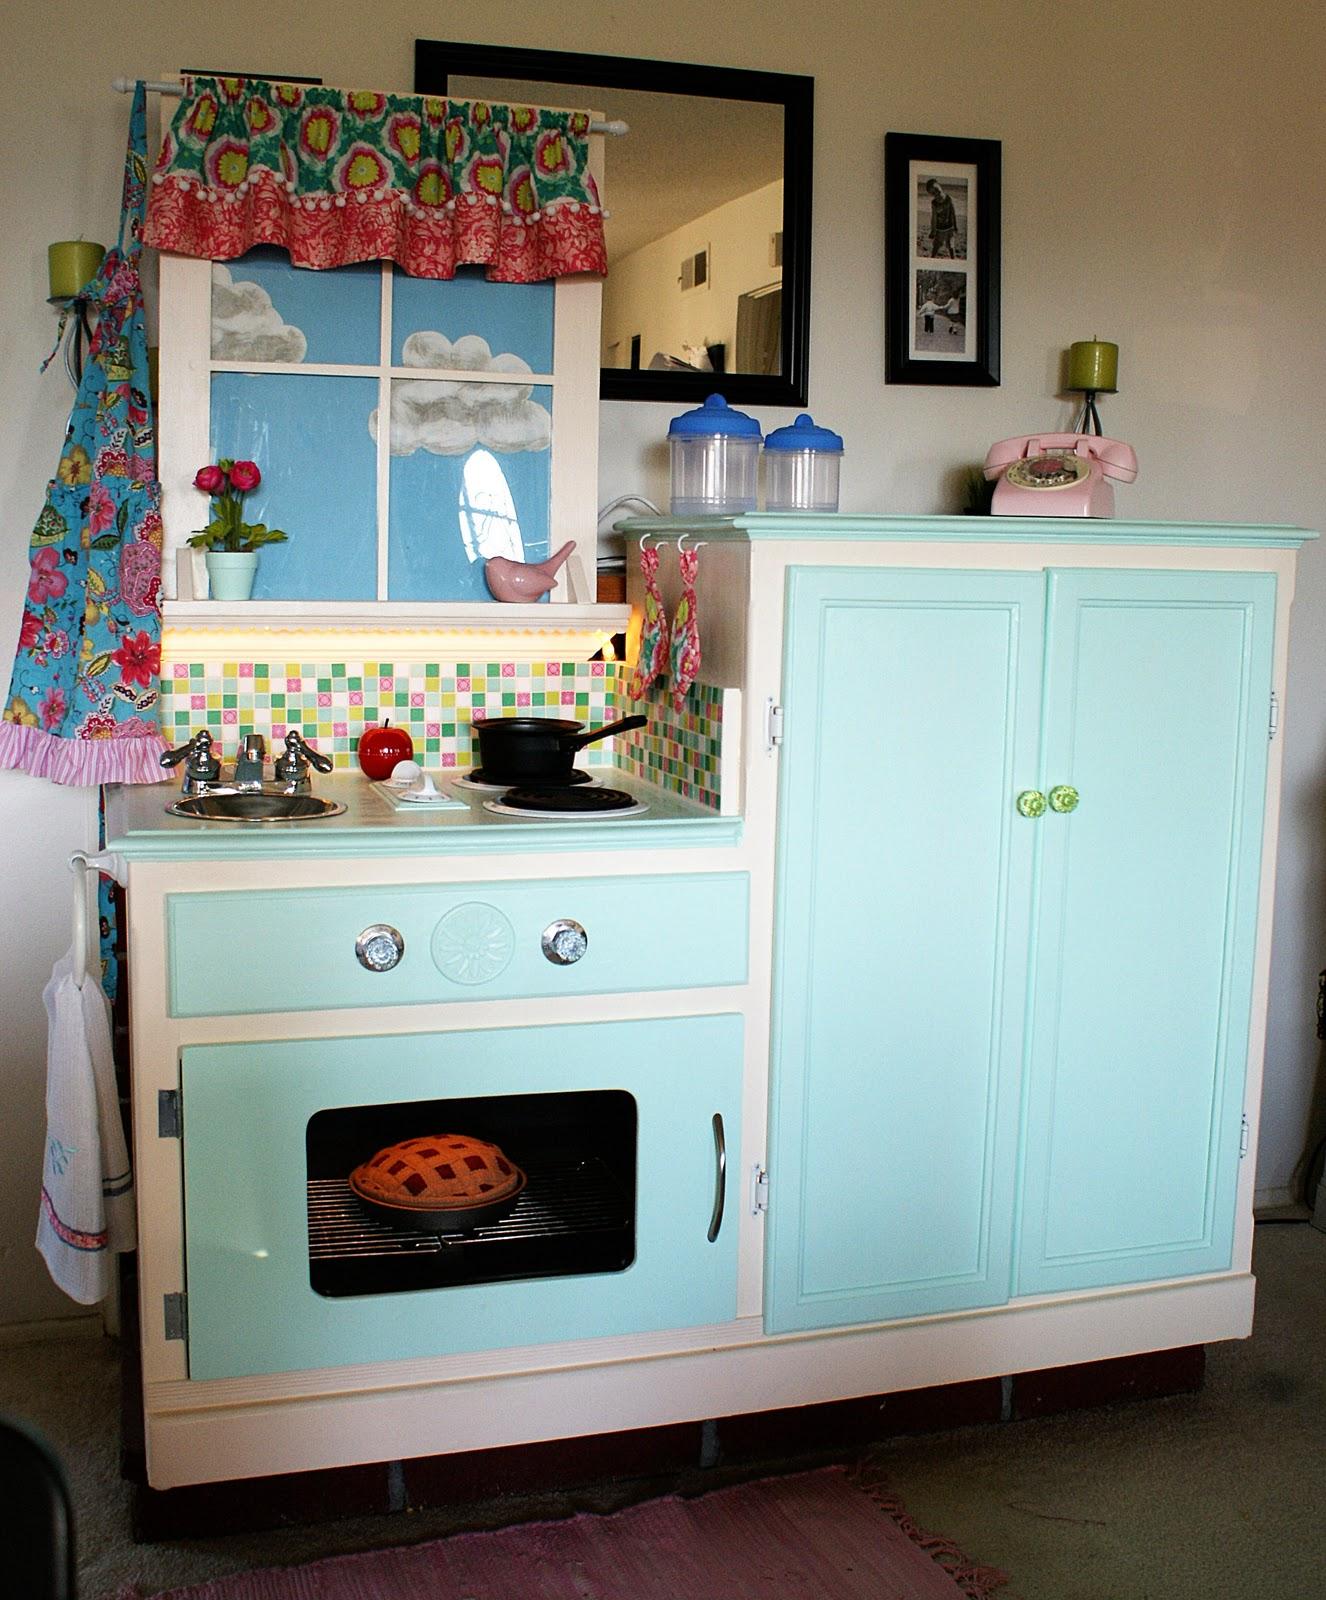 Easy peasy pie play kitchen for Childrens kitchenette